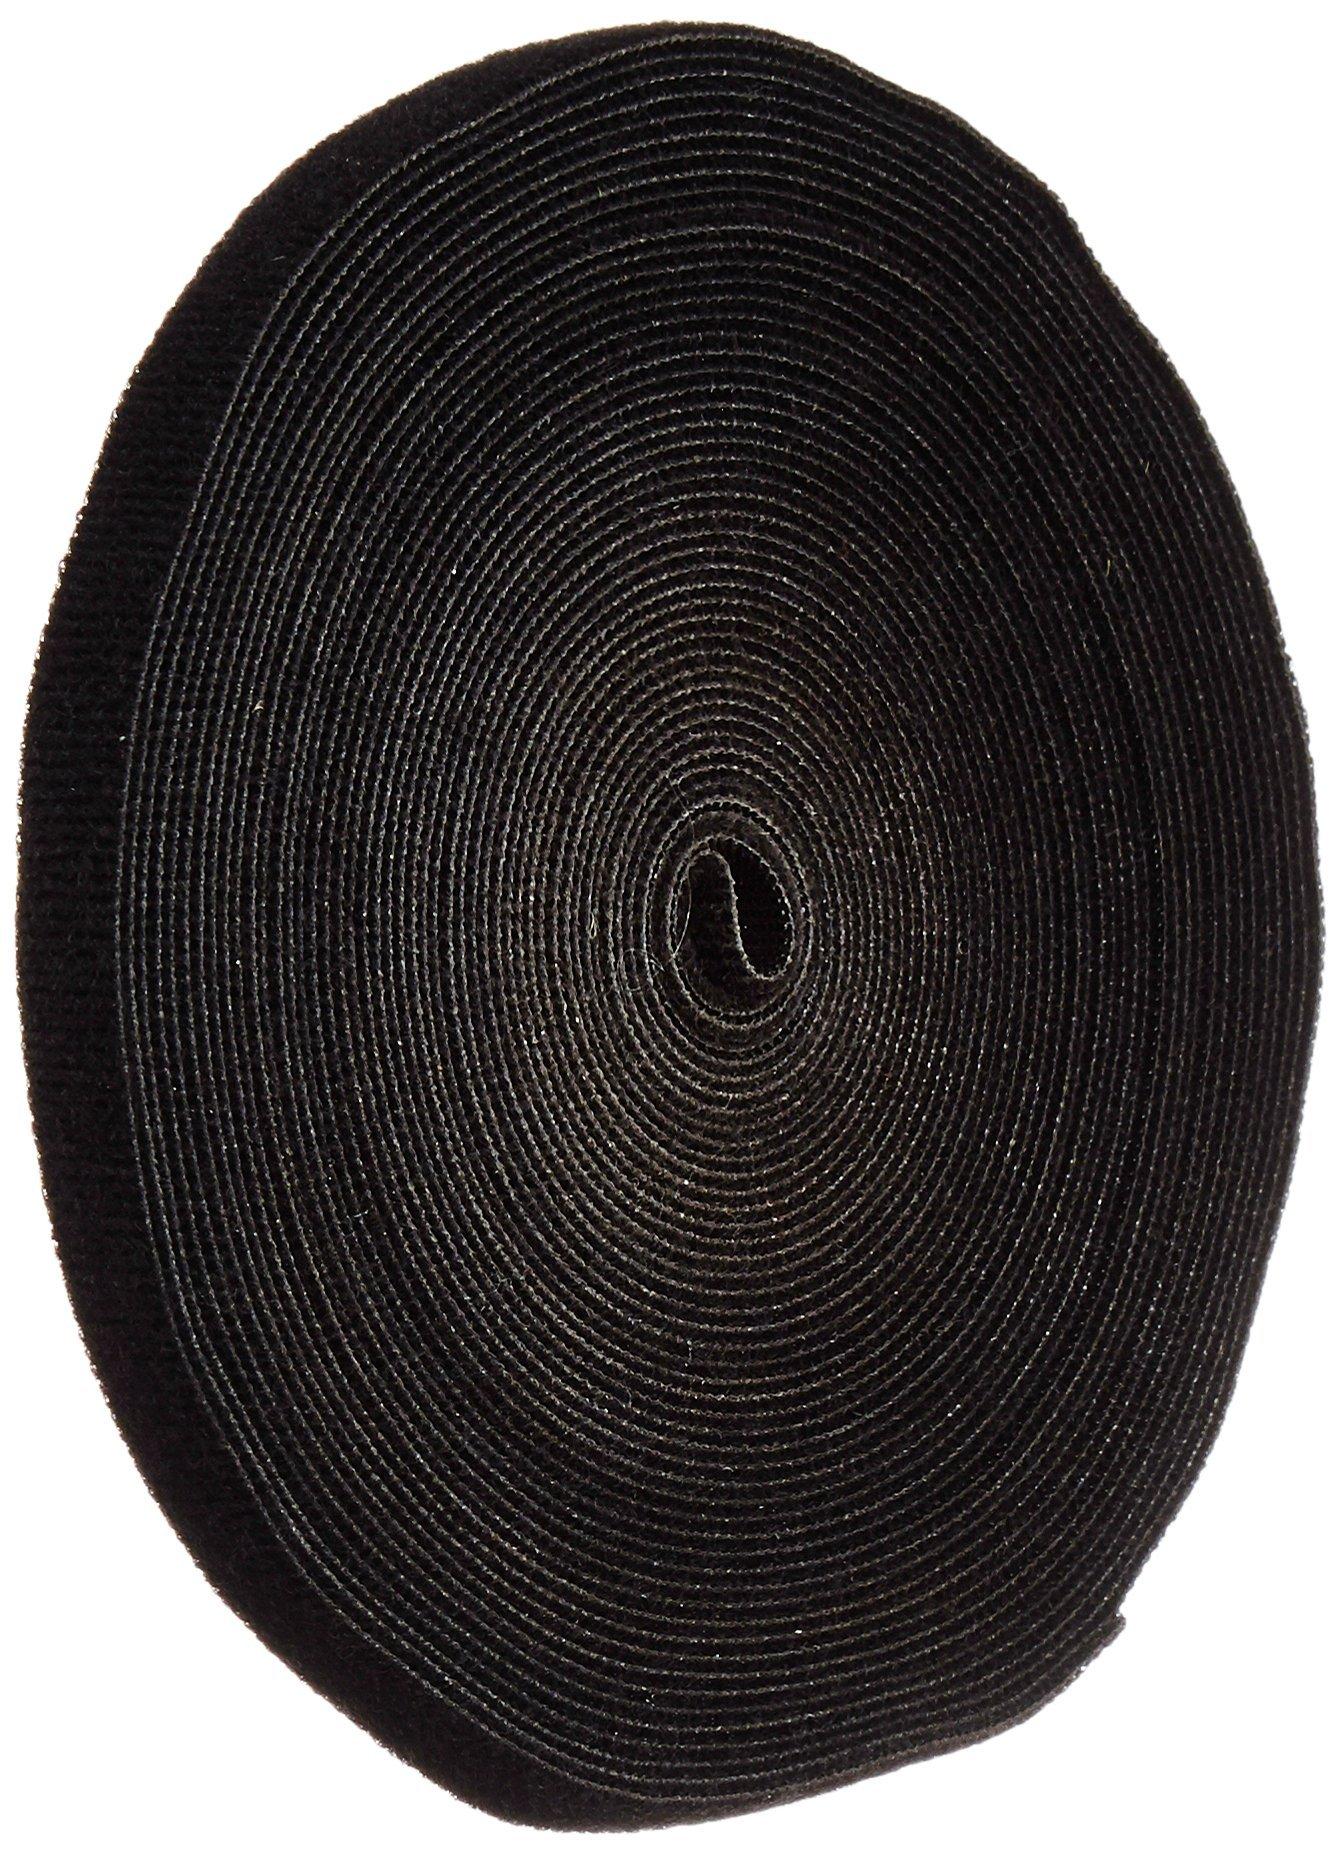 VELCRO 1801-OW-PB/B Black Nylon Onewrap Velcro Strap, Hook and Loop, 1/2'' Wide, 50' Length